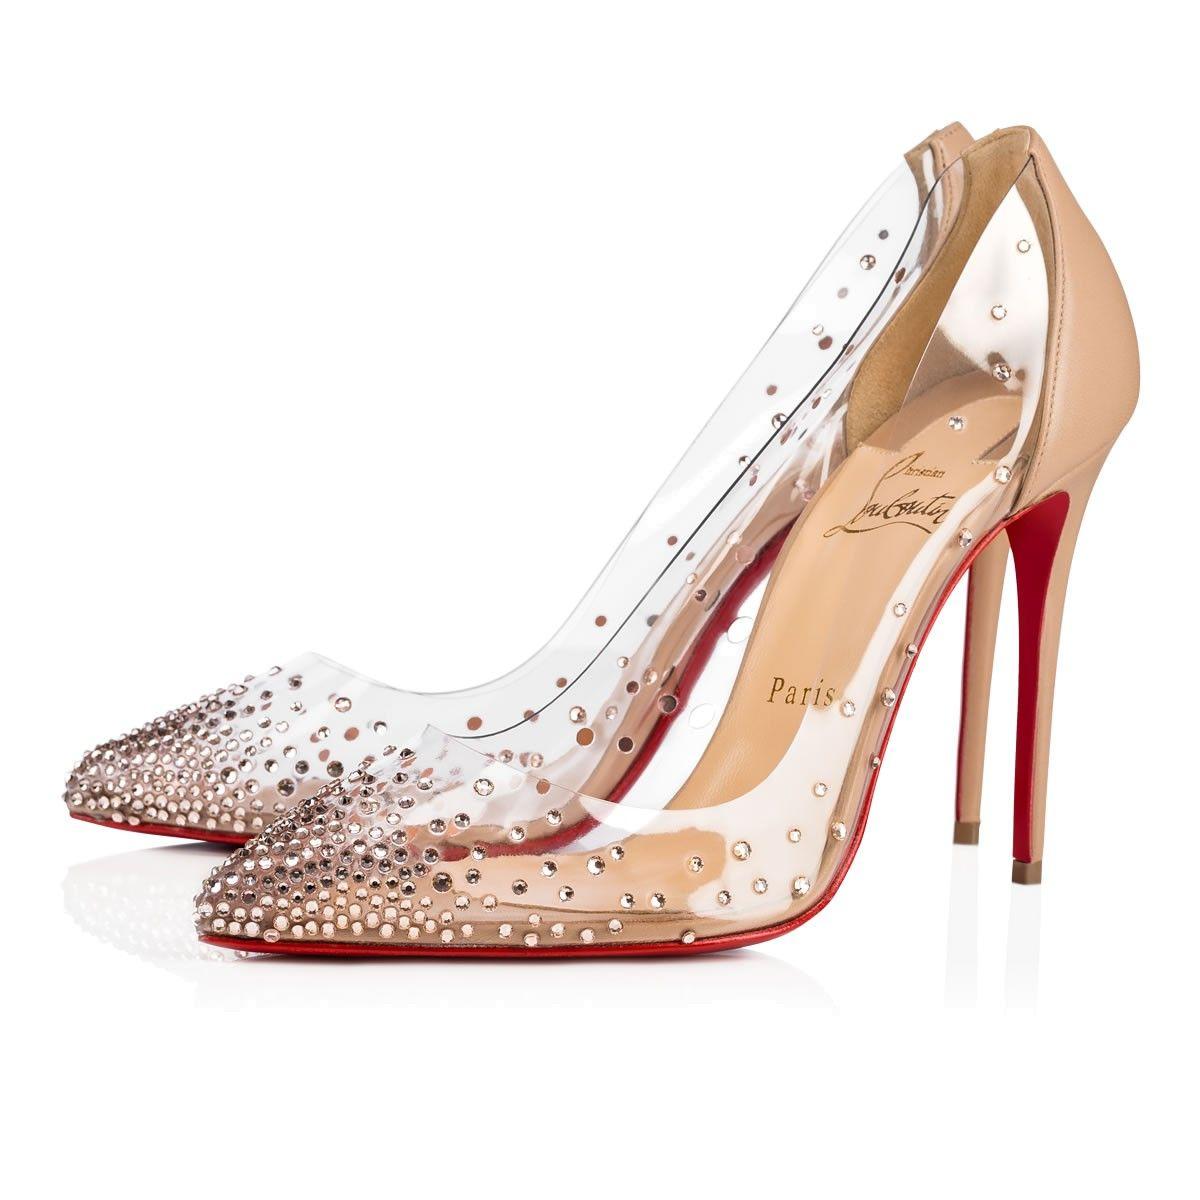 Stiletto heels, Christian louboutin